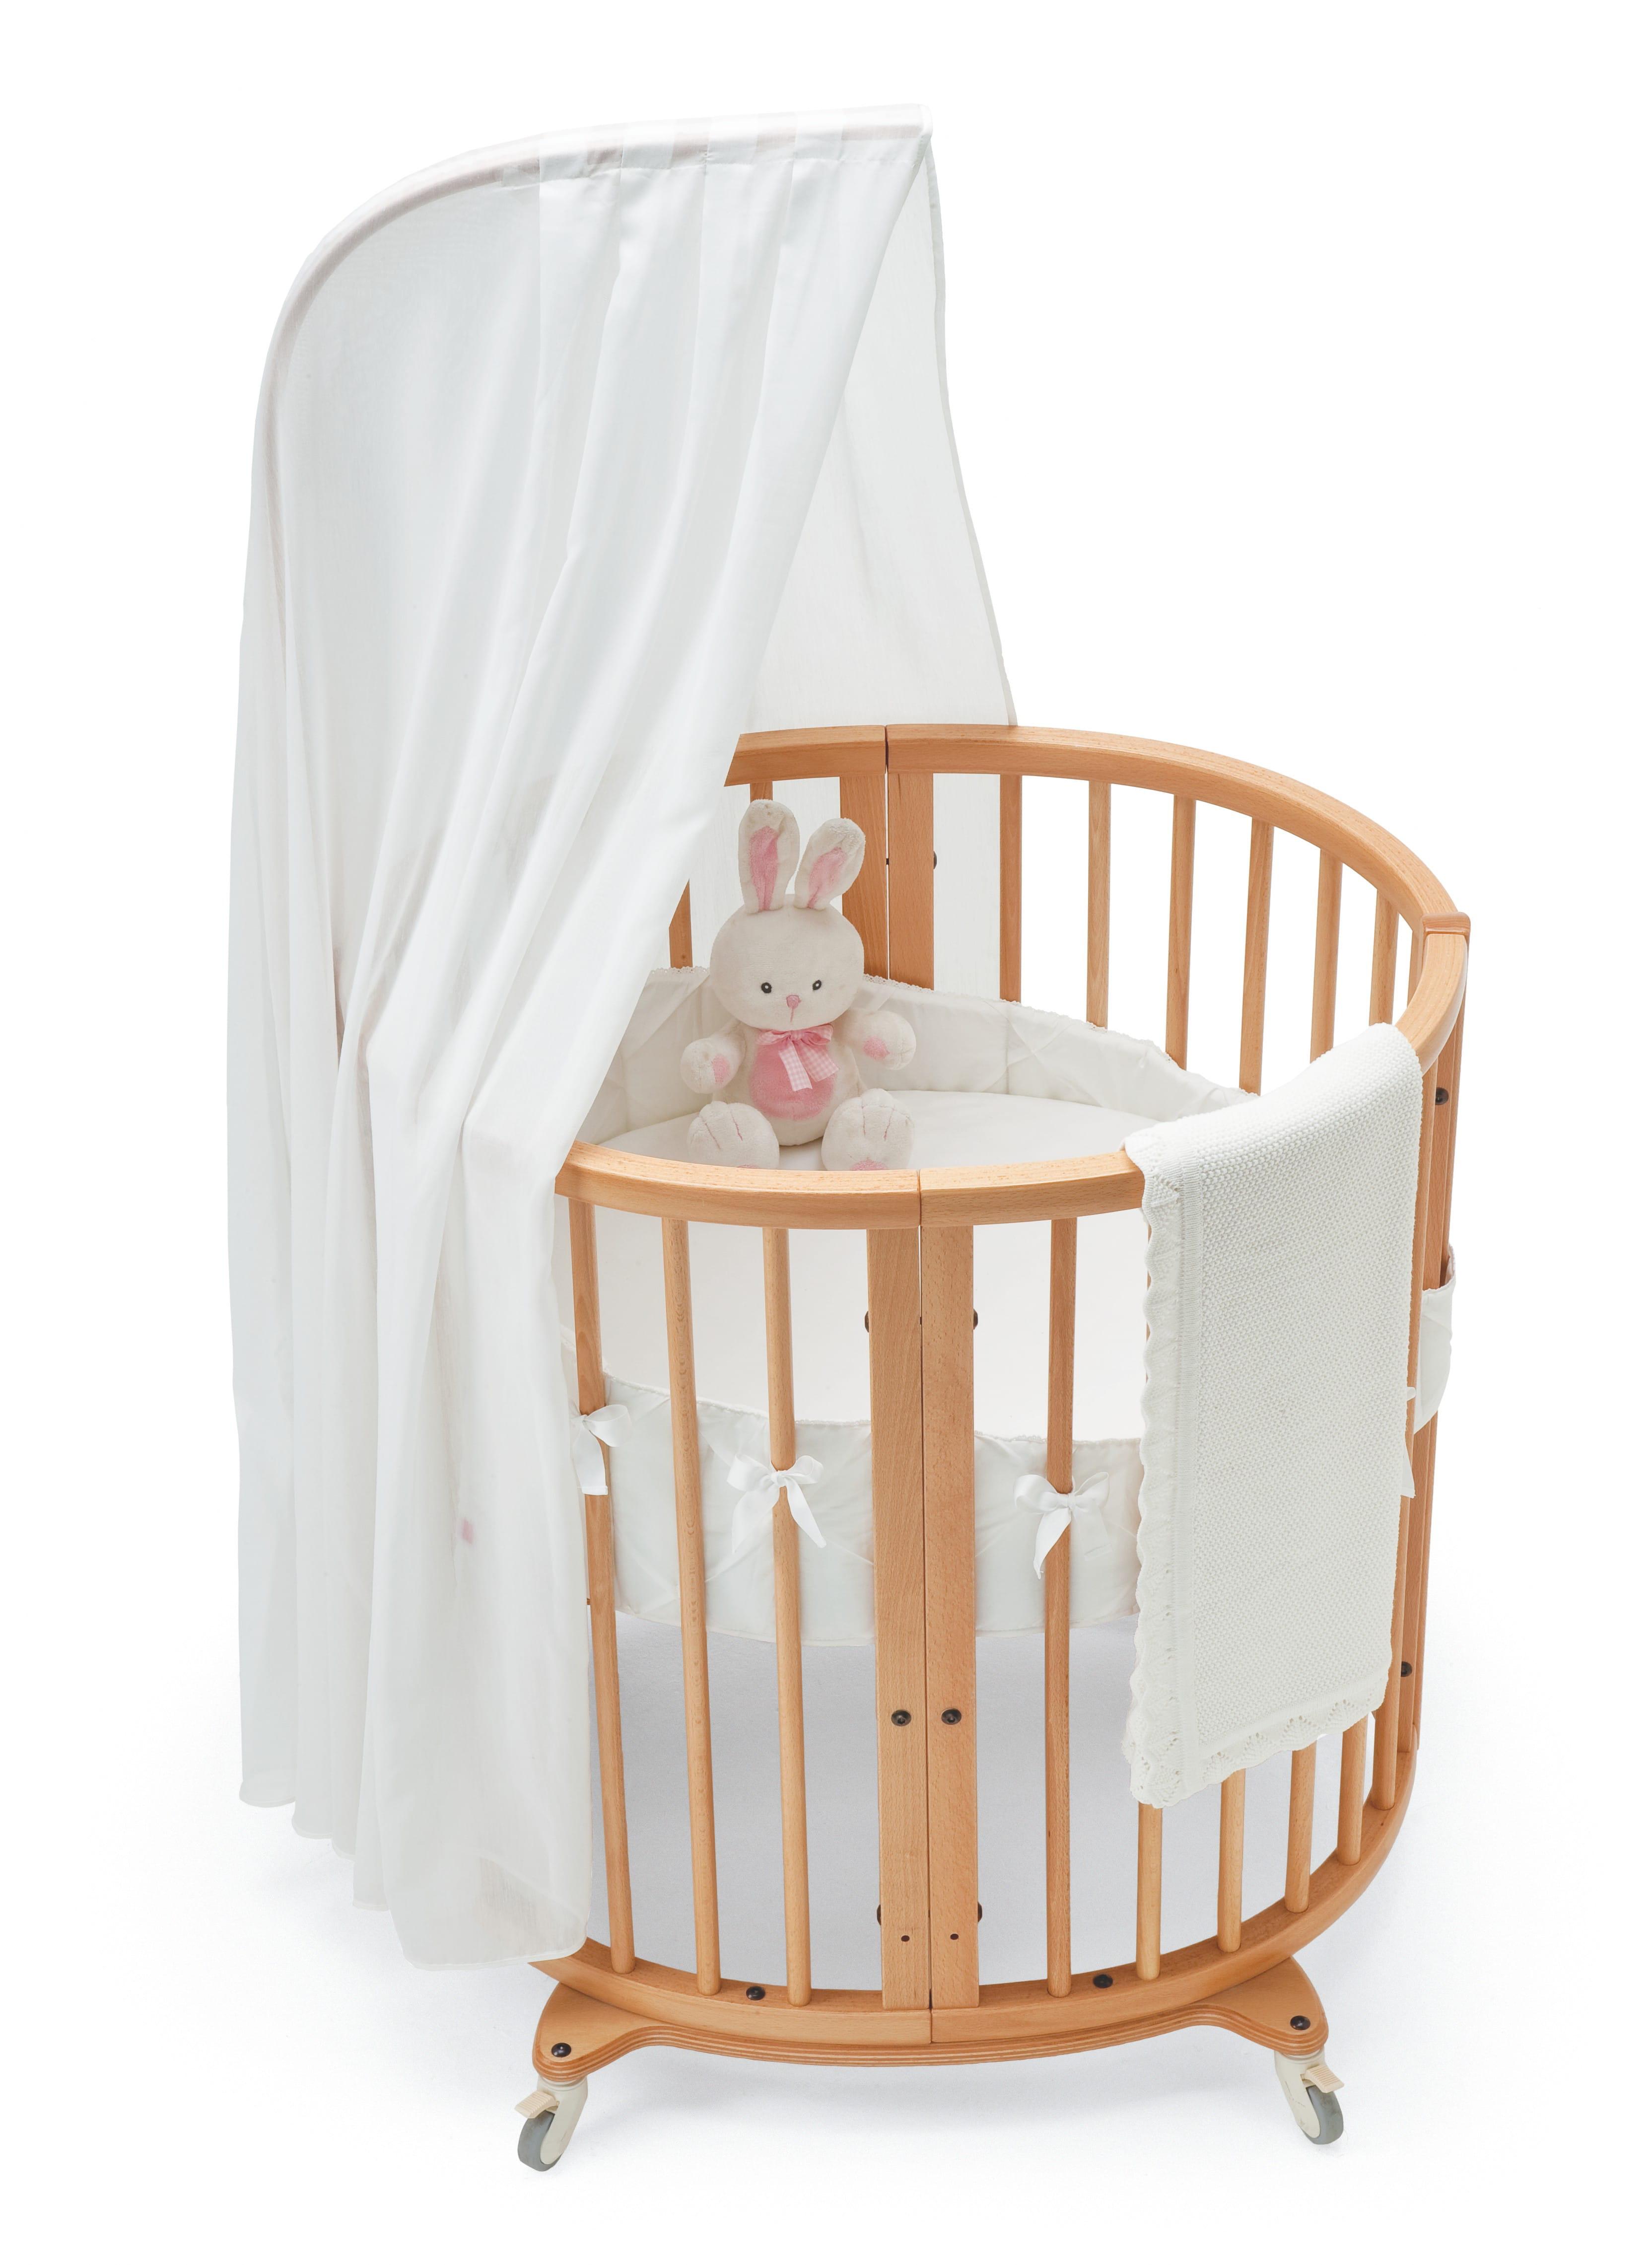 lit de b b sleepi mini de stokke. Black Bedroom Furniture Sets. Home Design Ideas